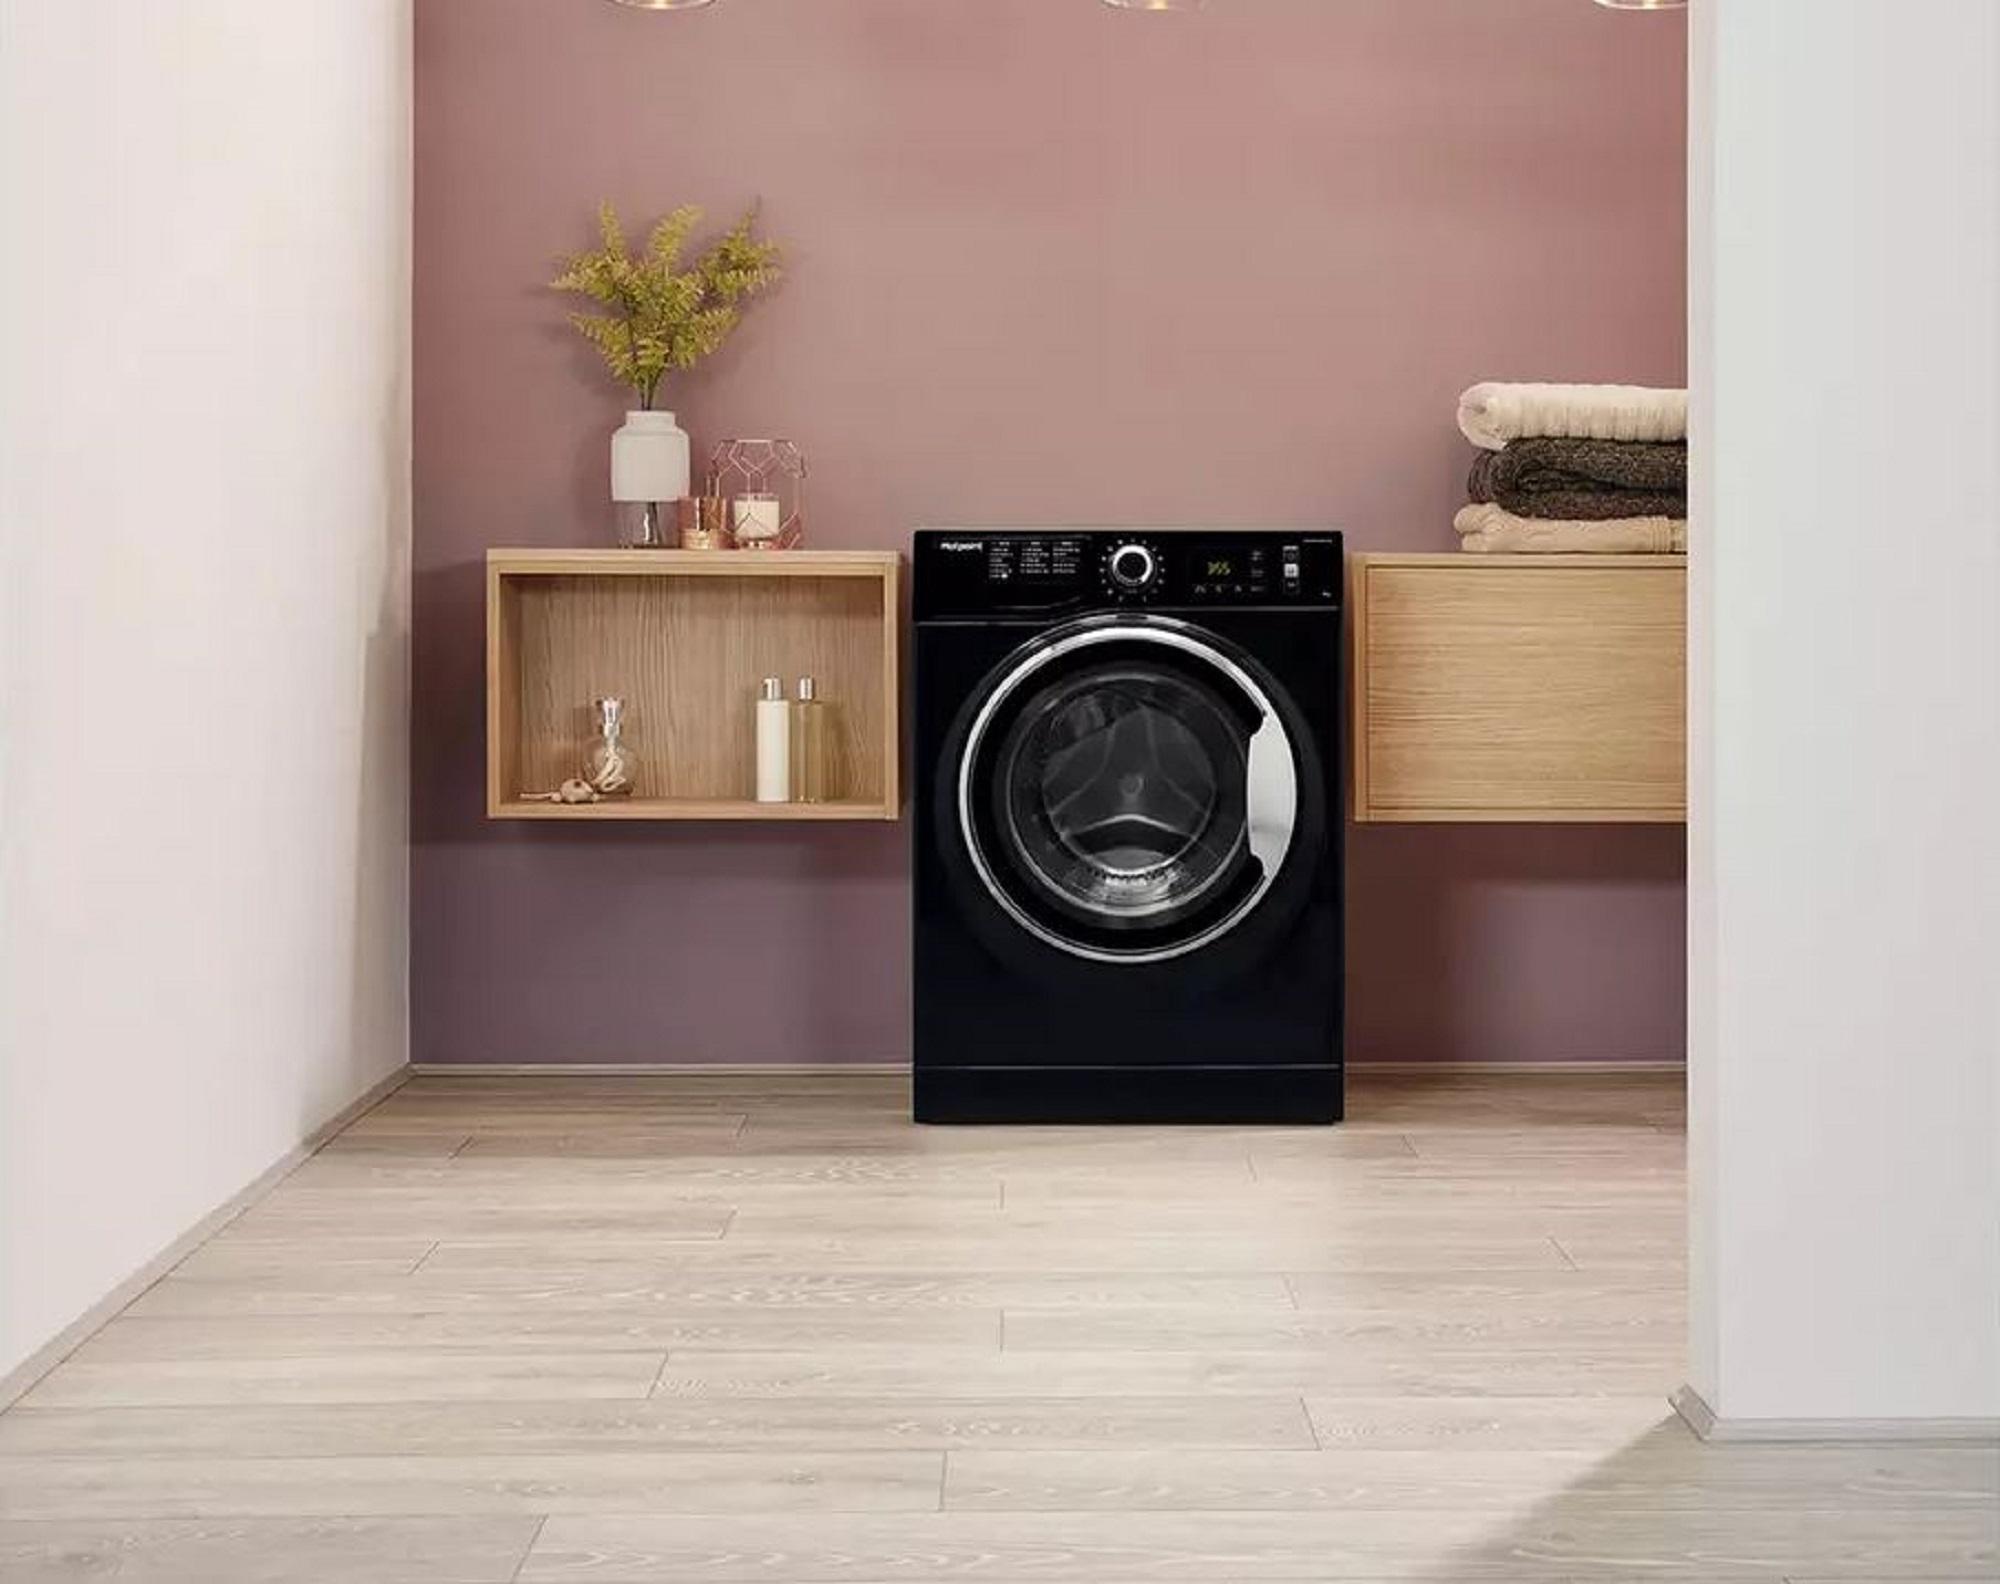 Best Washing Machine 2020 10 Budget And Quiet Washing Machines